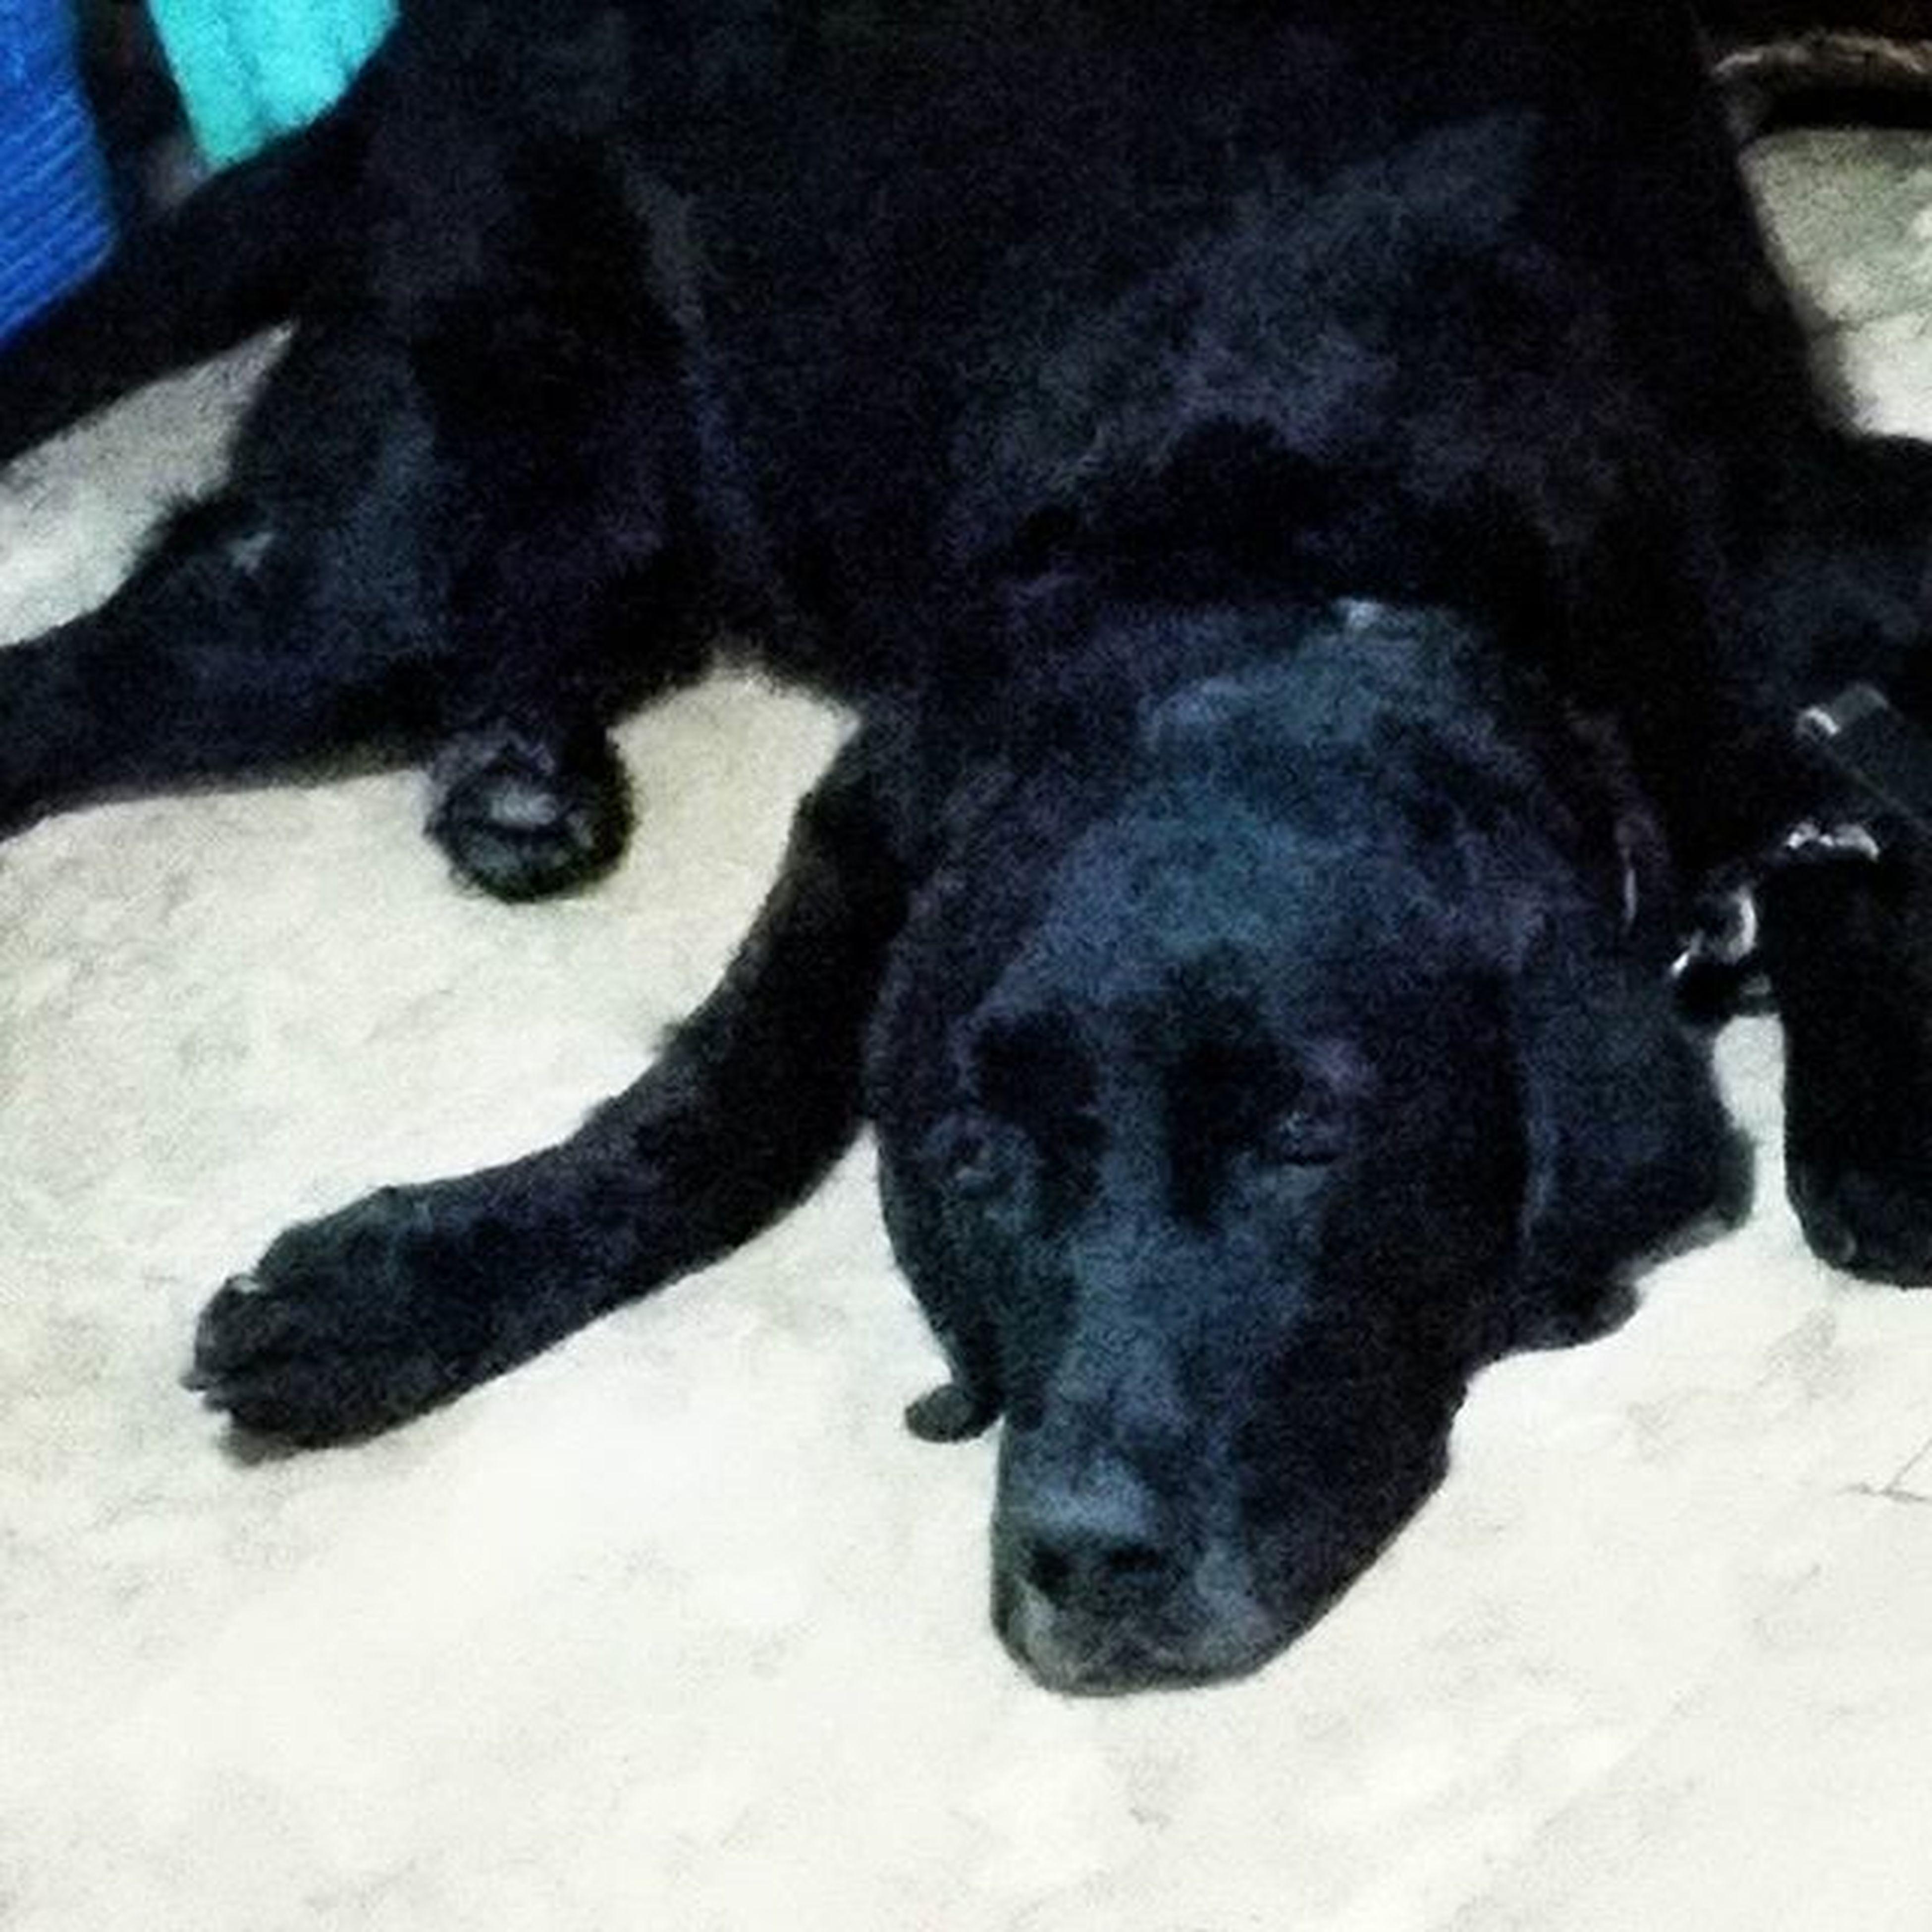 my fat black dog Jumboz Labrador